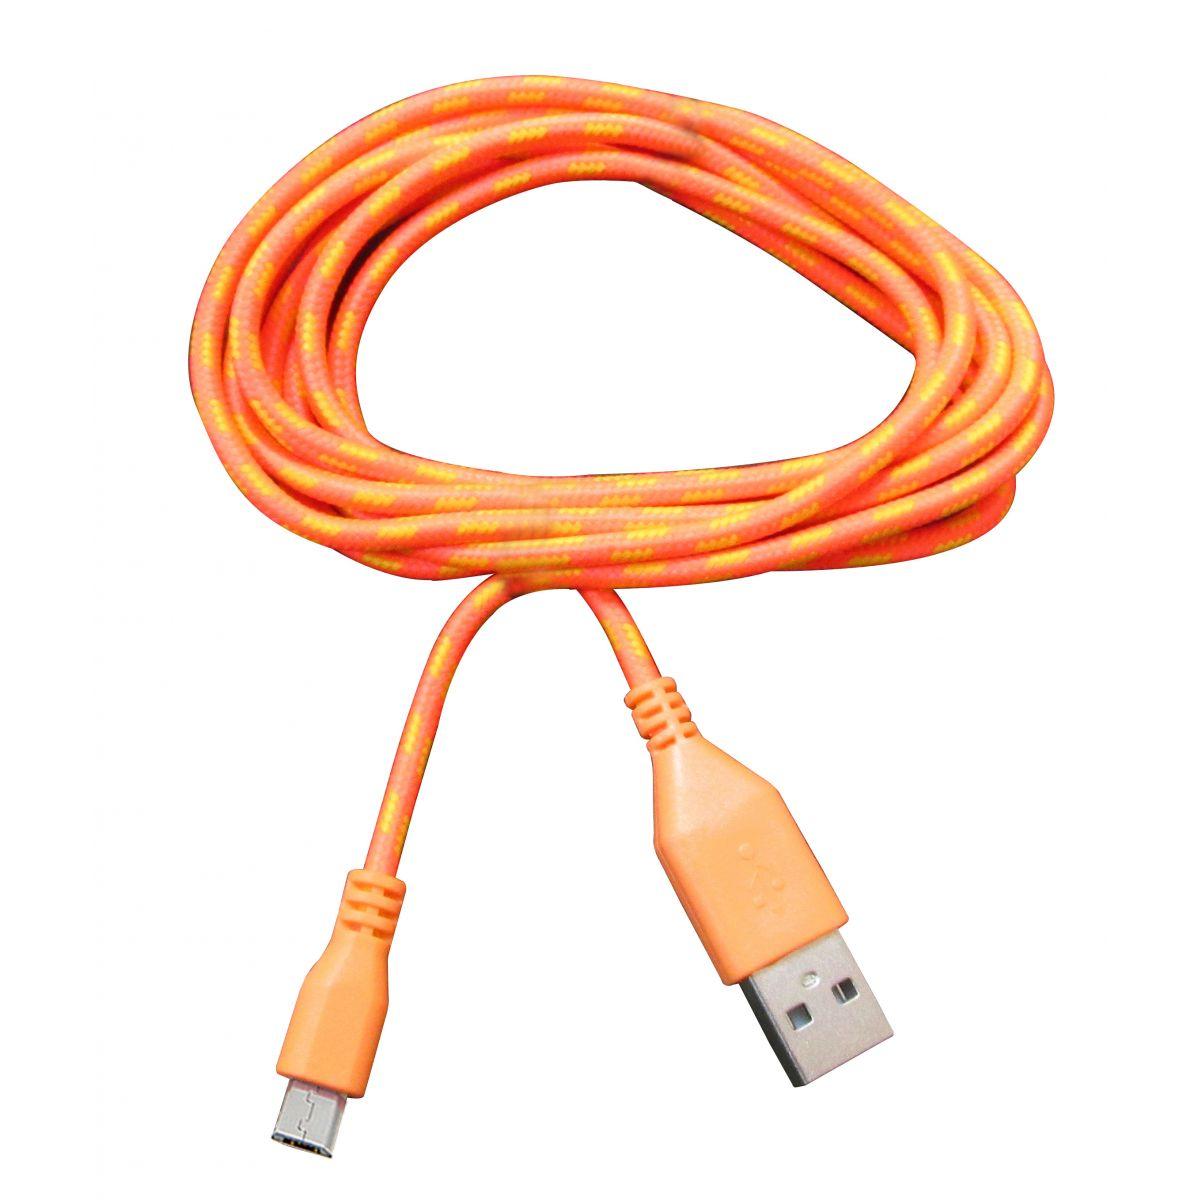 Cabo de Dados Estilo Corda Micro USB 2 Metros - Laranja